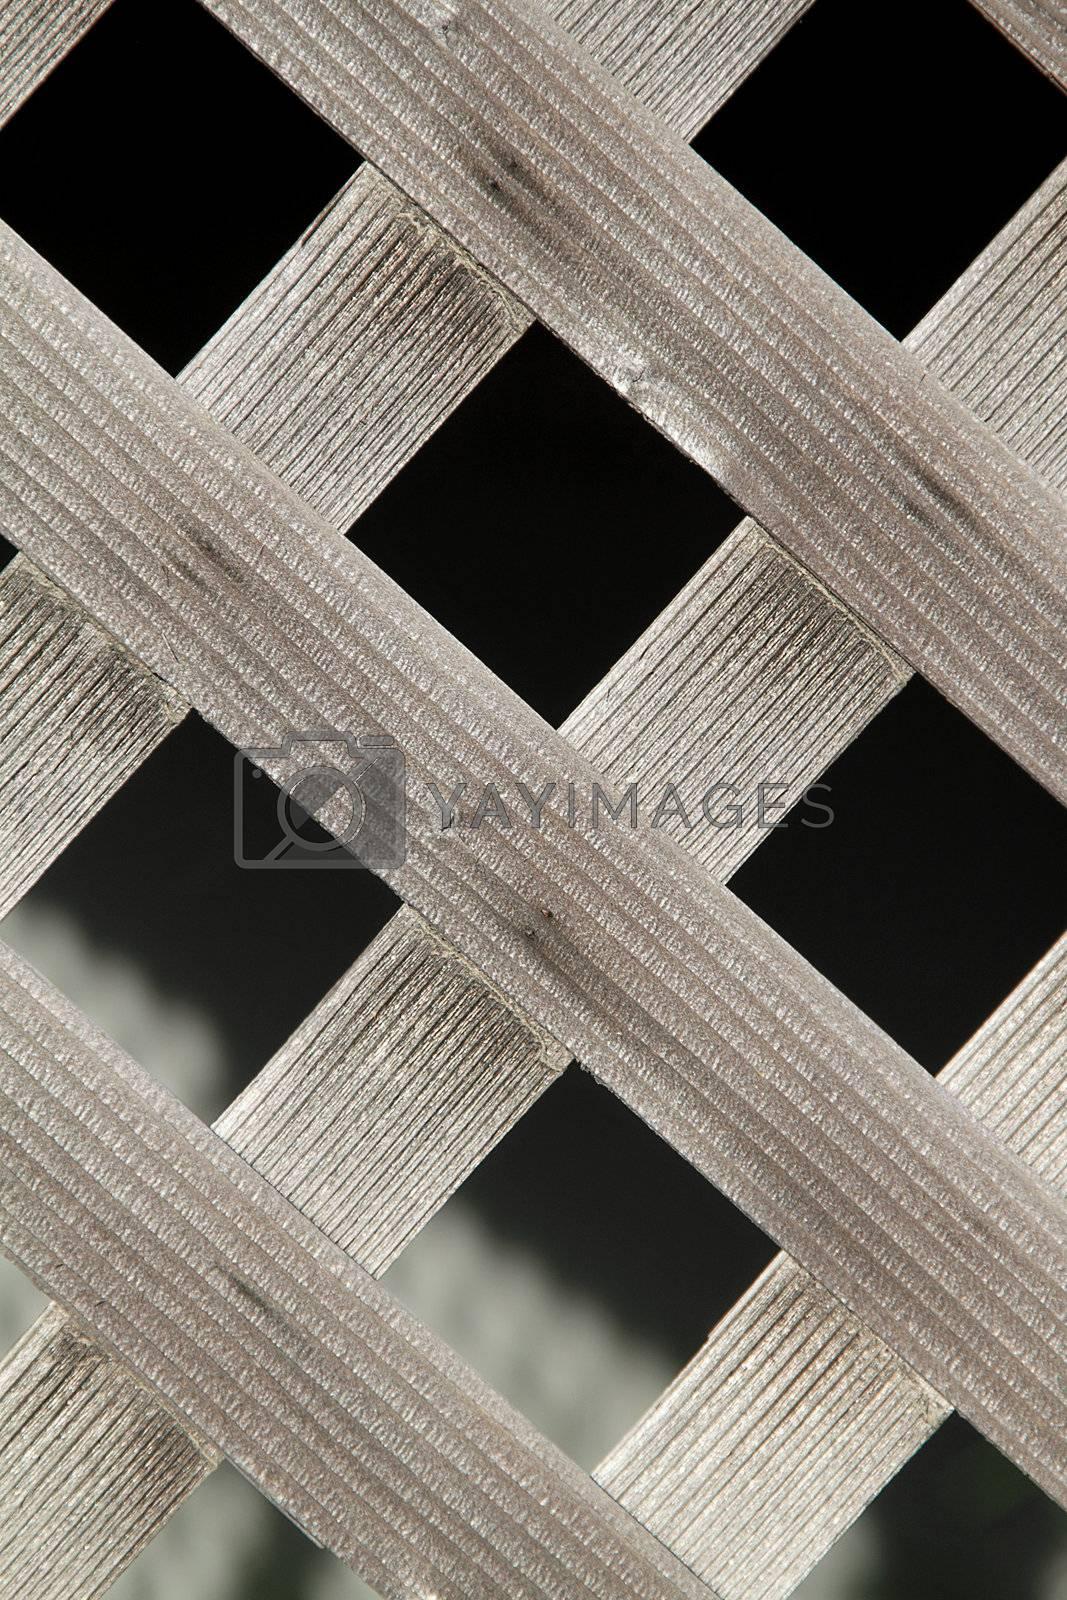 Old wooden diagonal fence over dark background